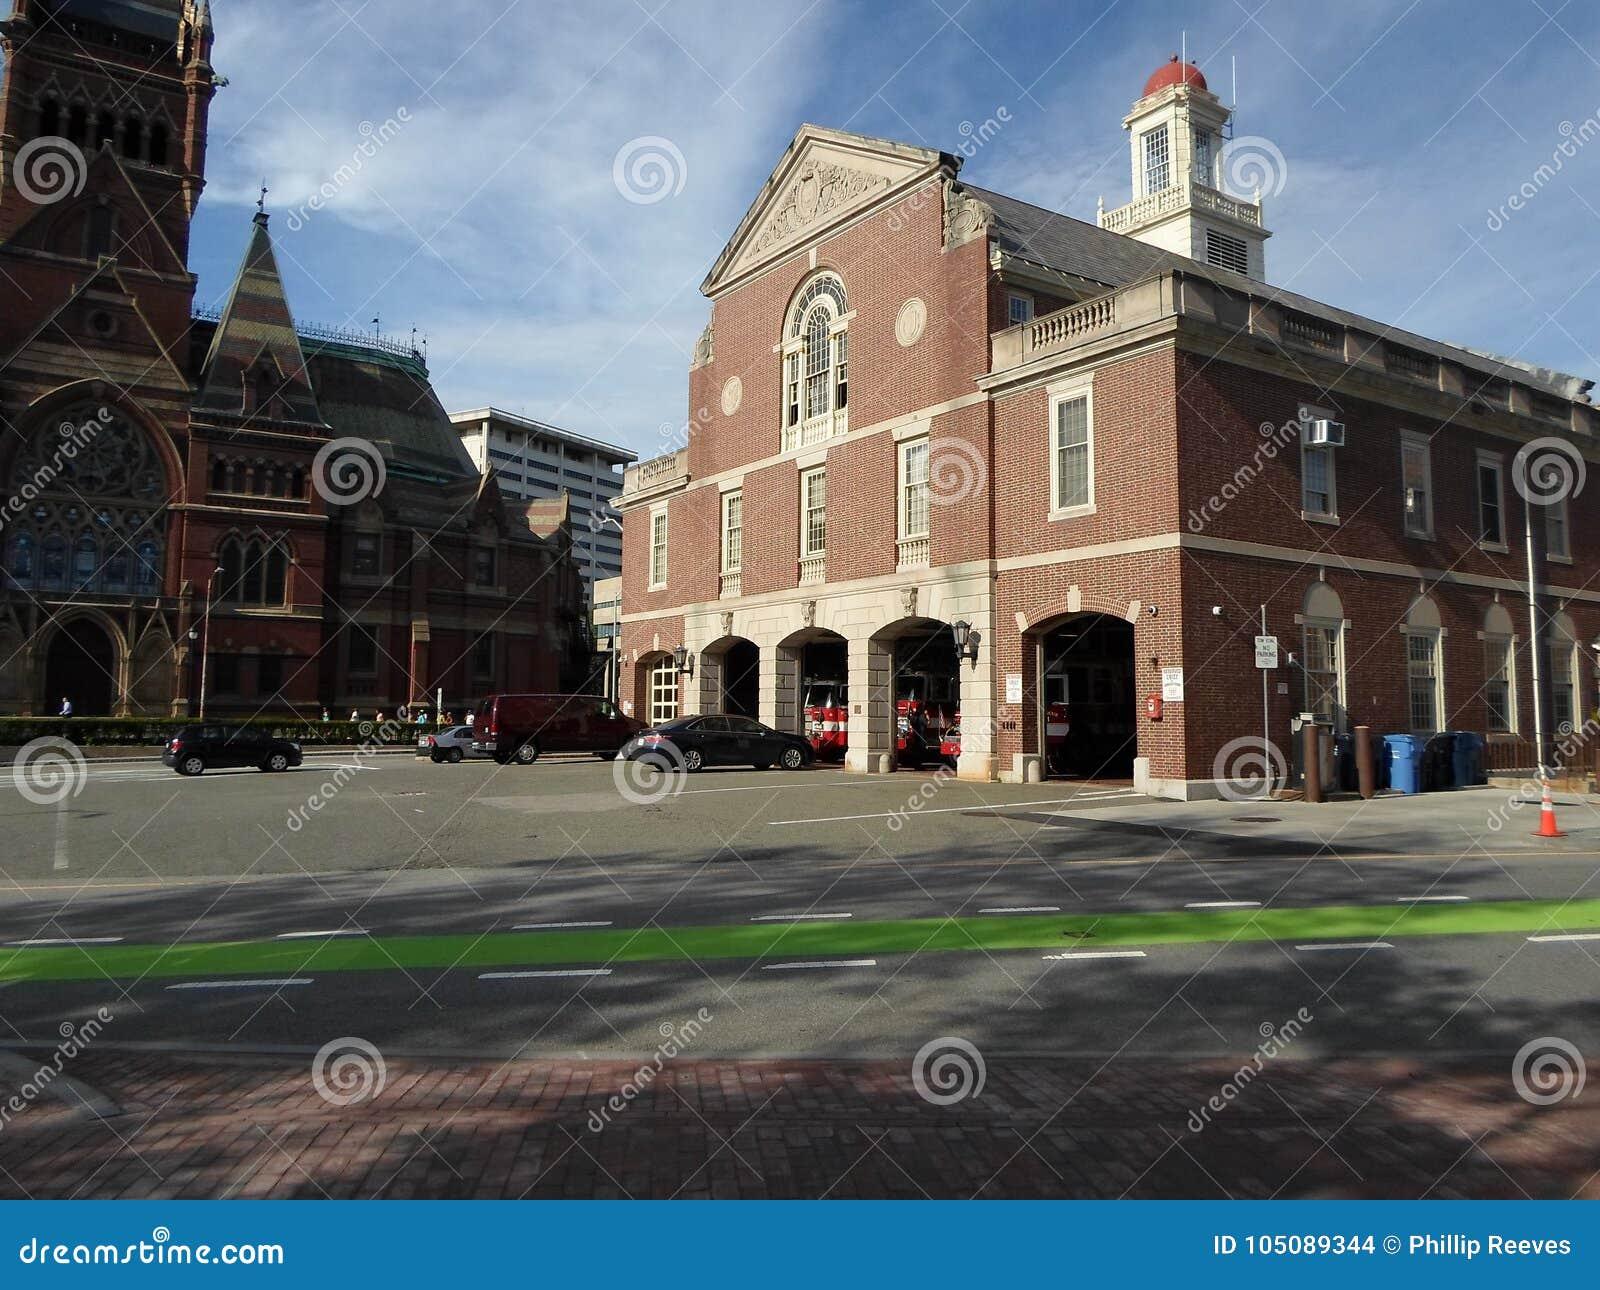 Cambridge-Feuer-Hauptsitze und Memorial Hall, Cambridge, Massachusetts, USA